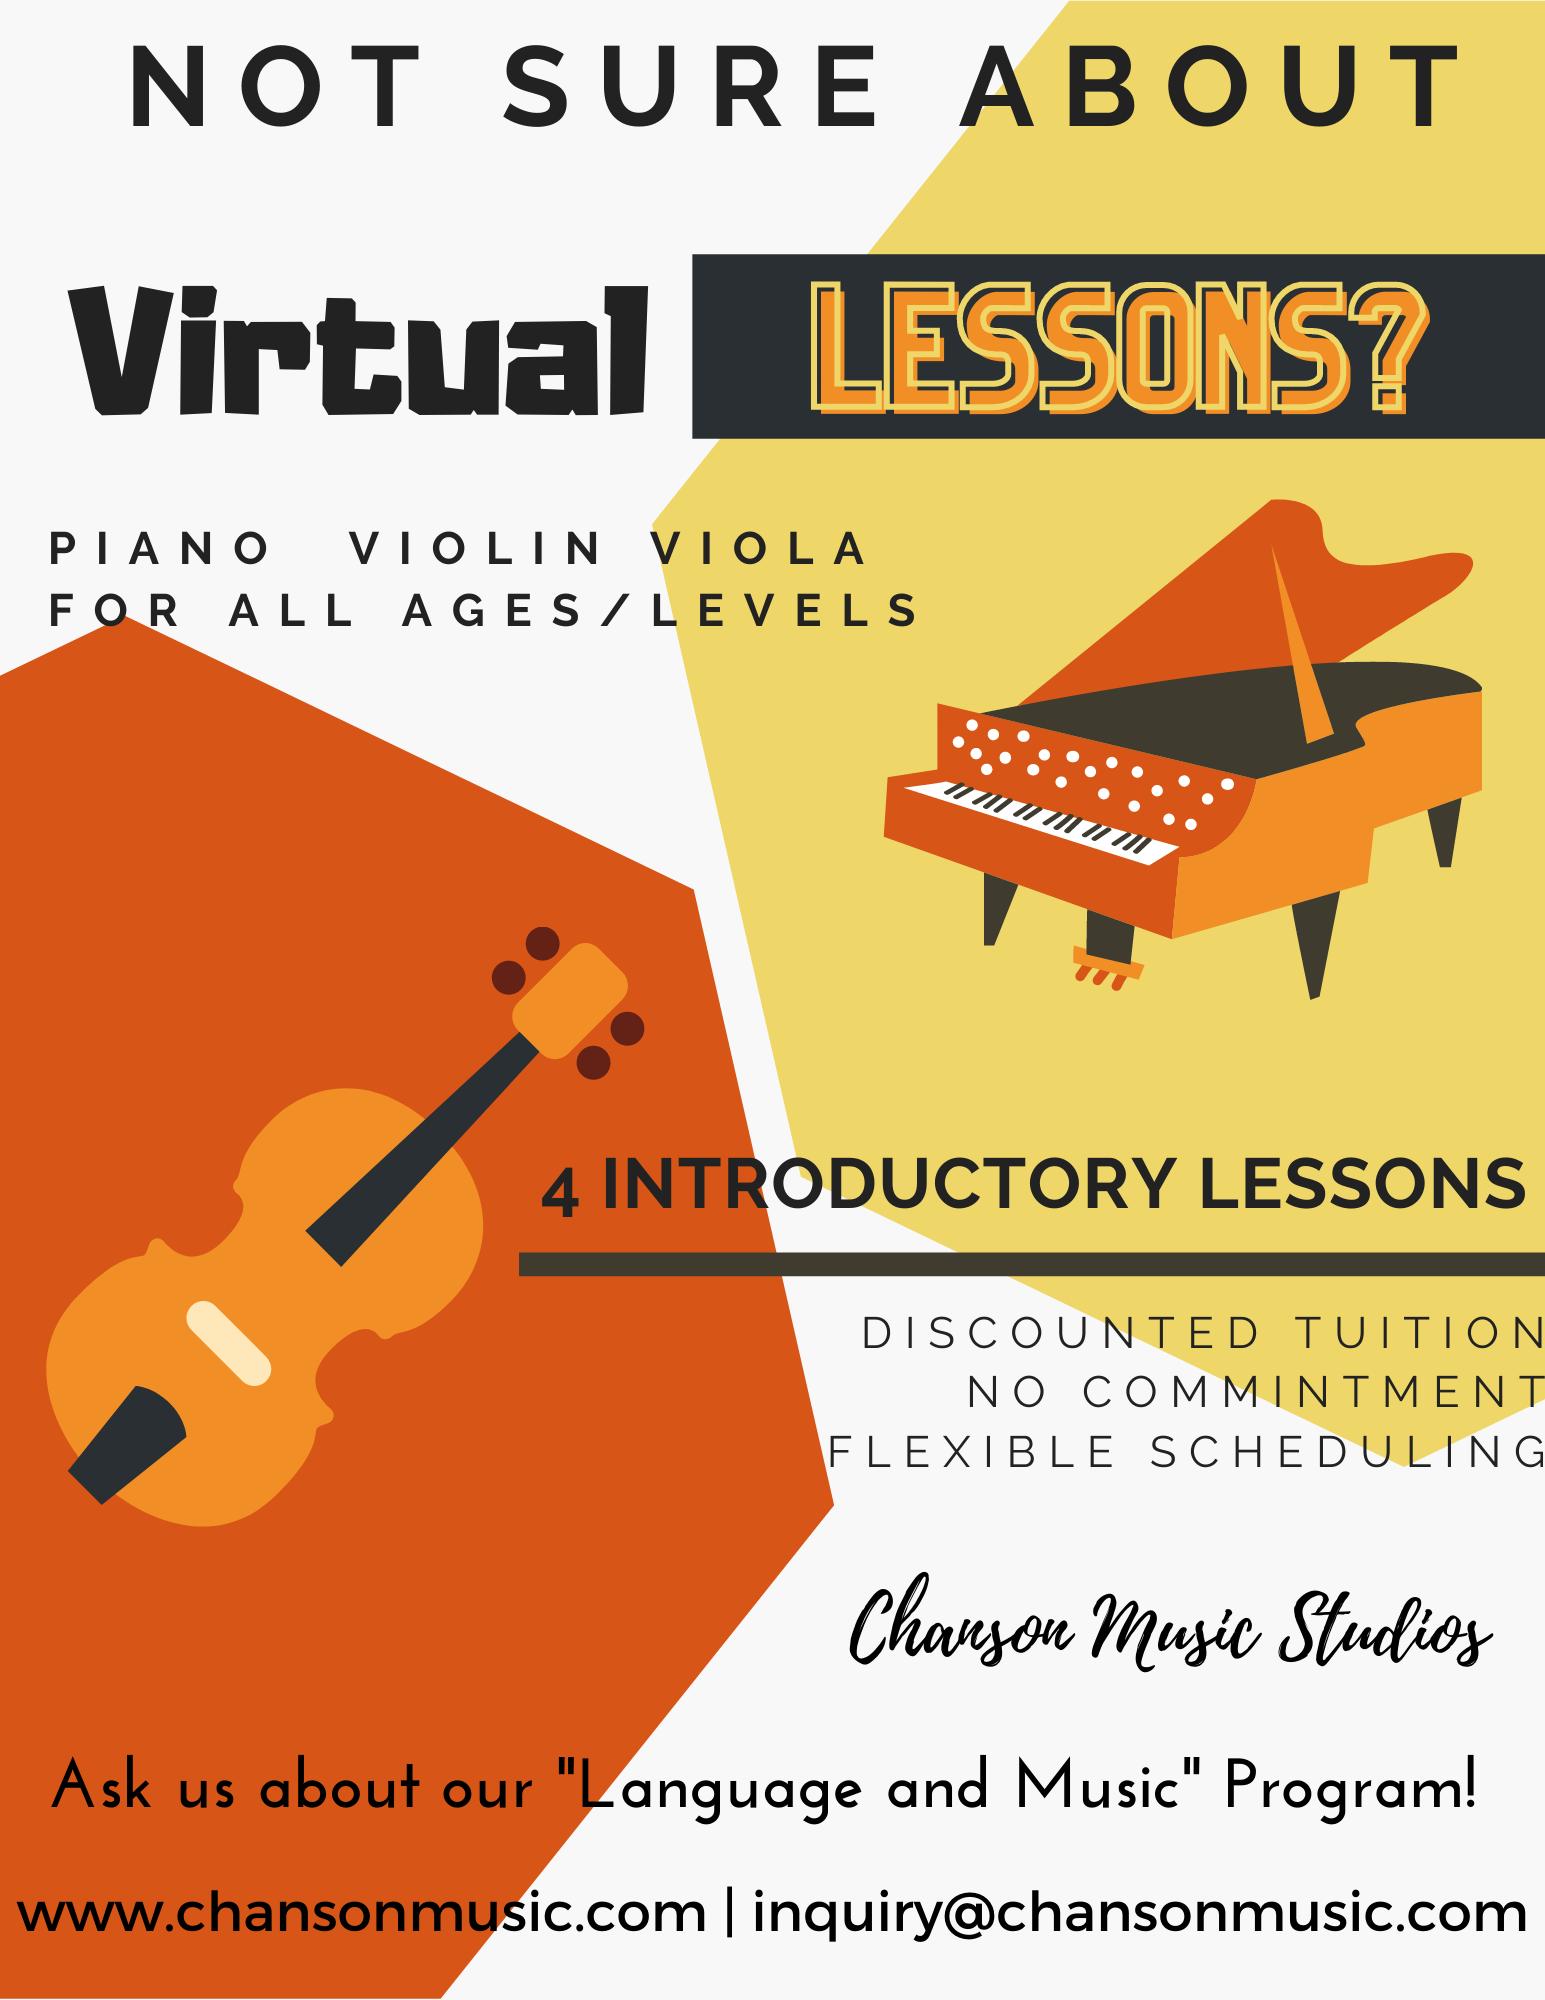 https://www.chansonmusic.com/lessons